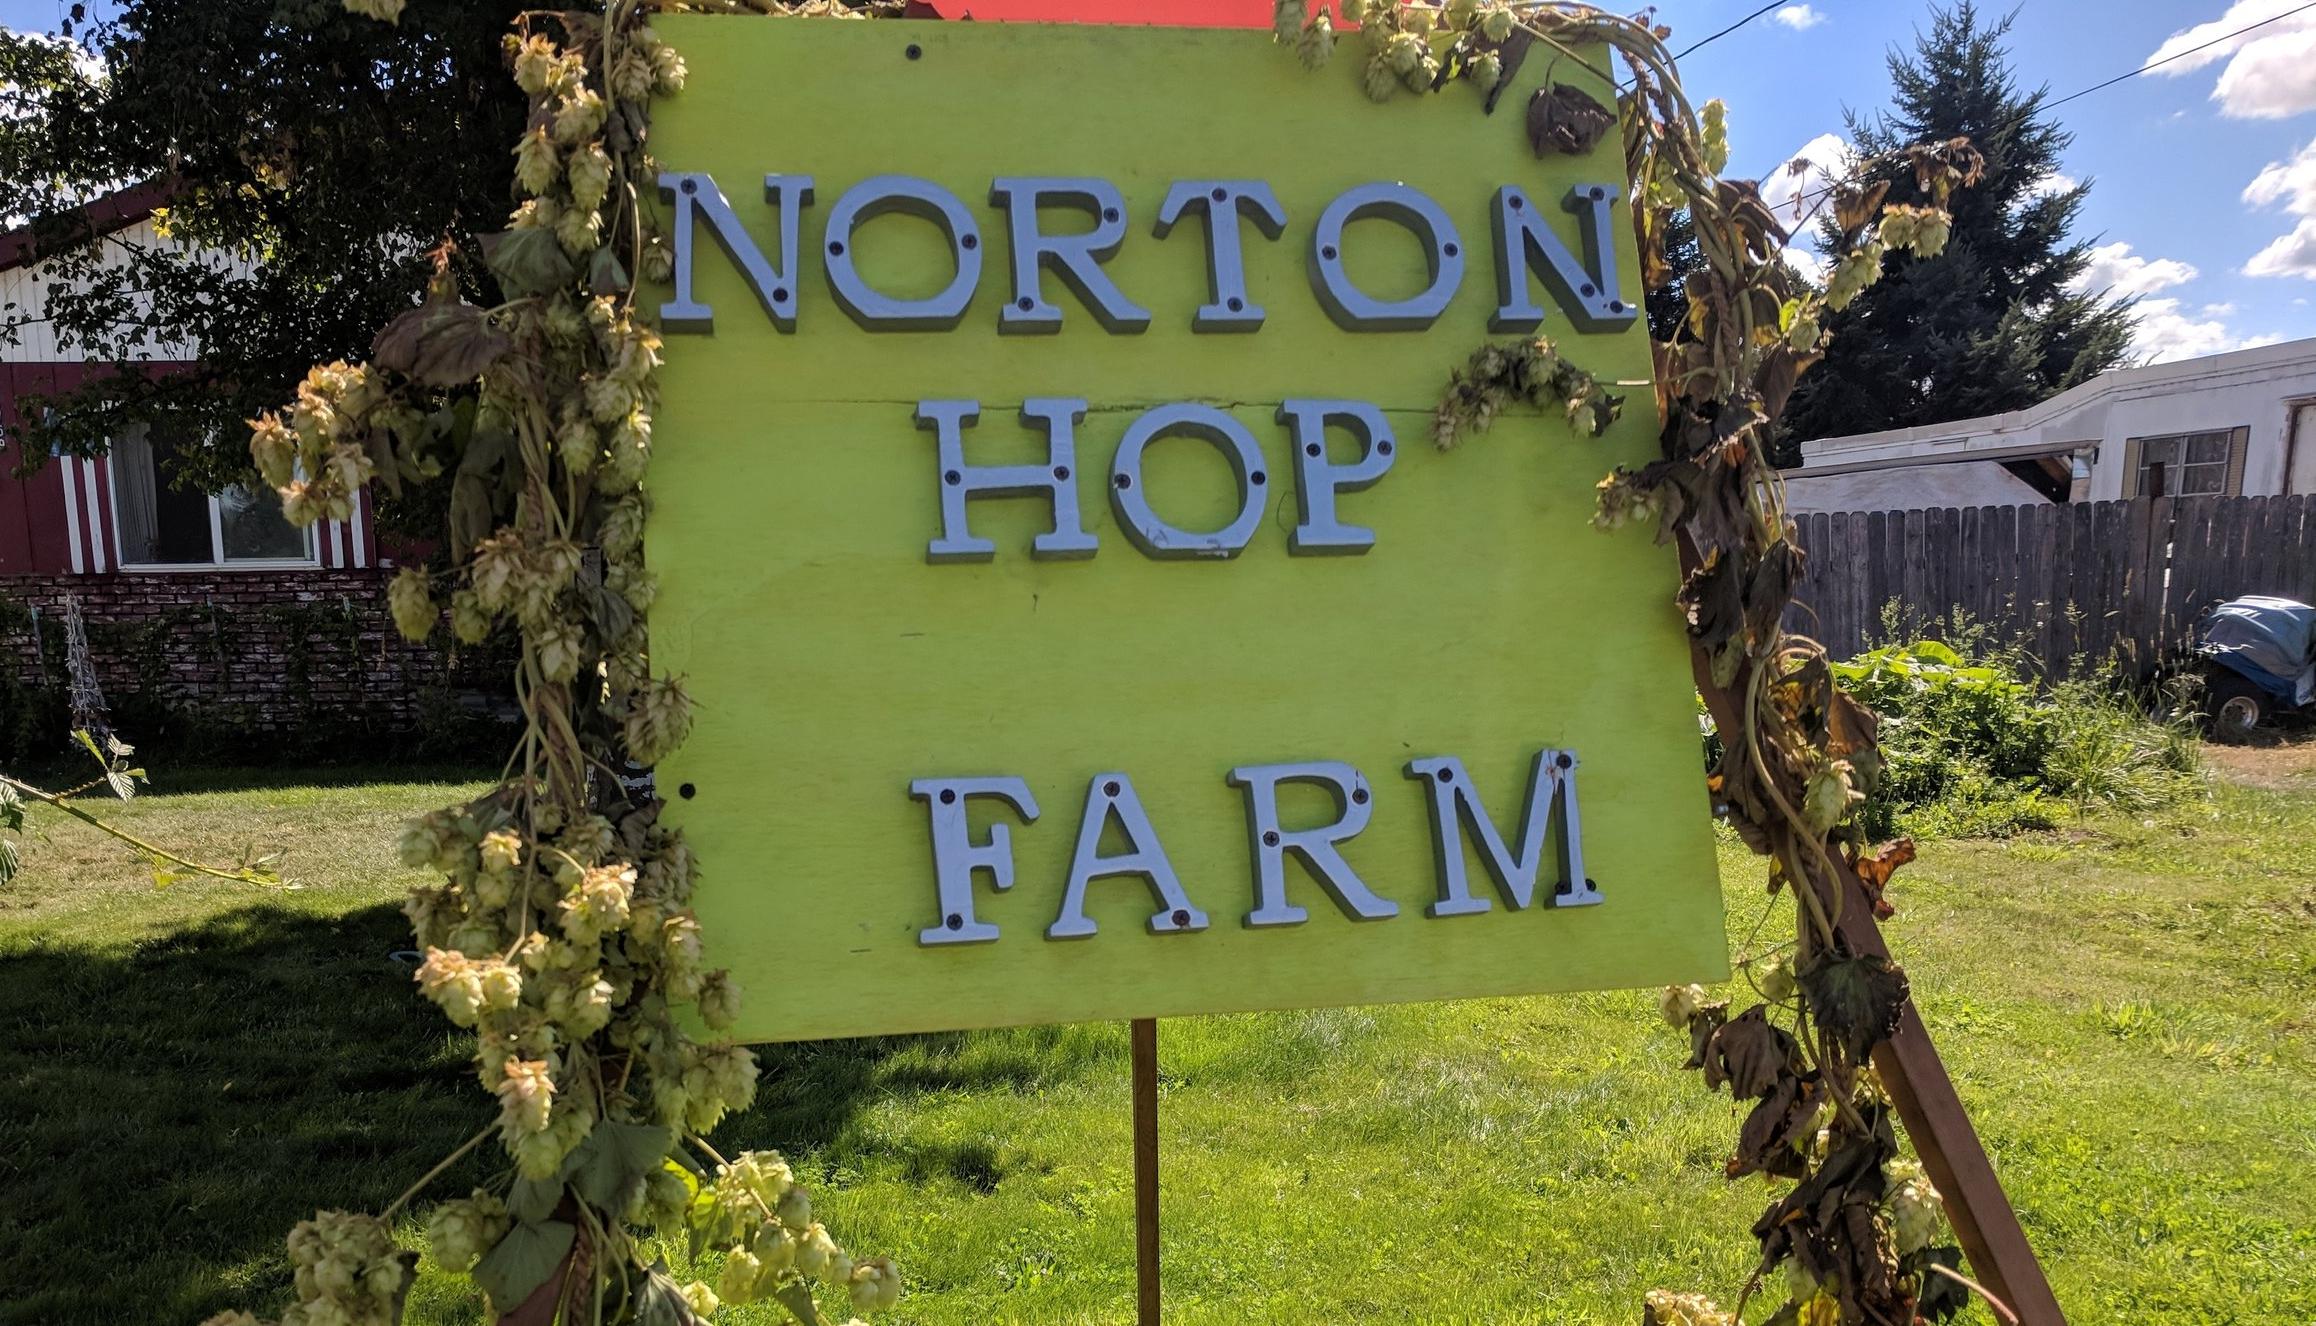 Norton Hop Farm!  Local Eugene hops!